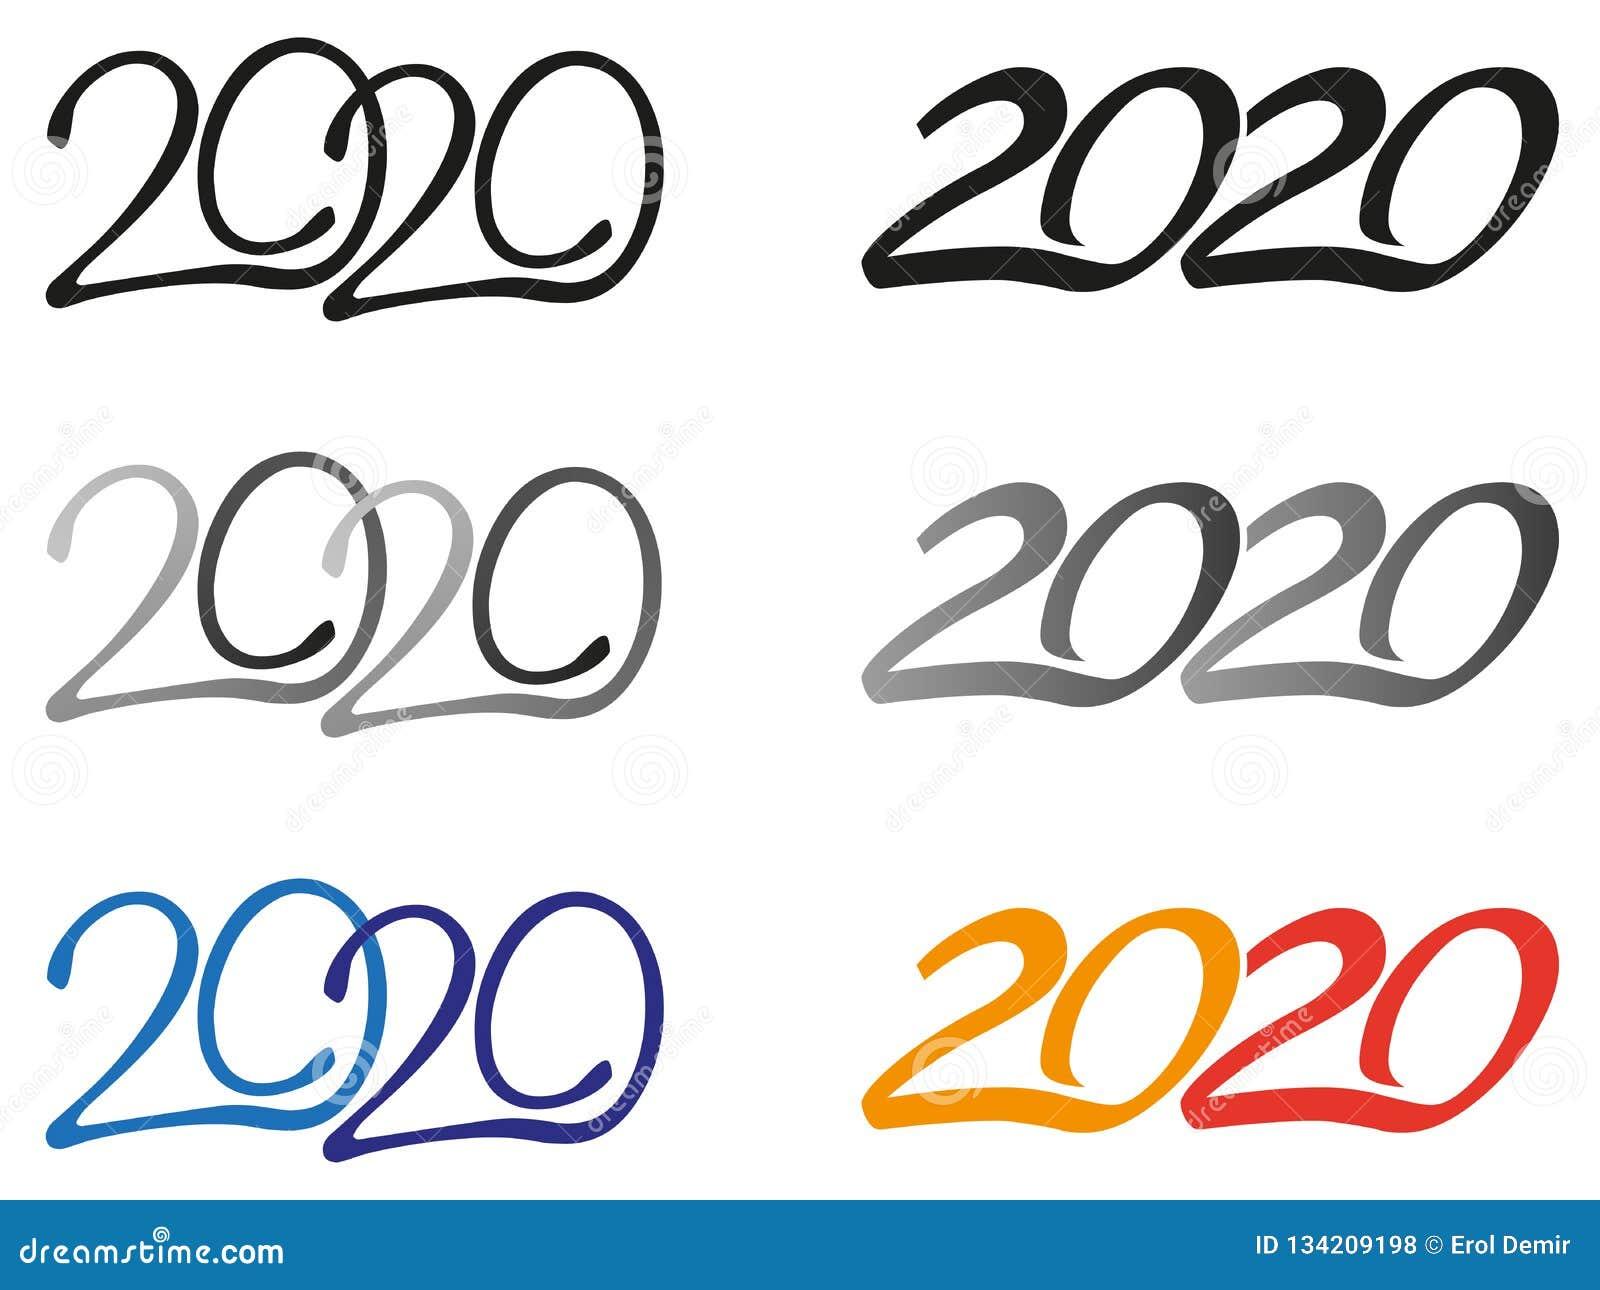 Roku 2020 logo